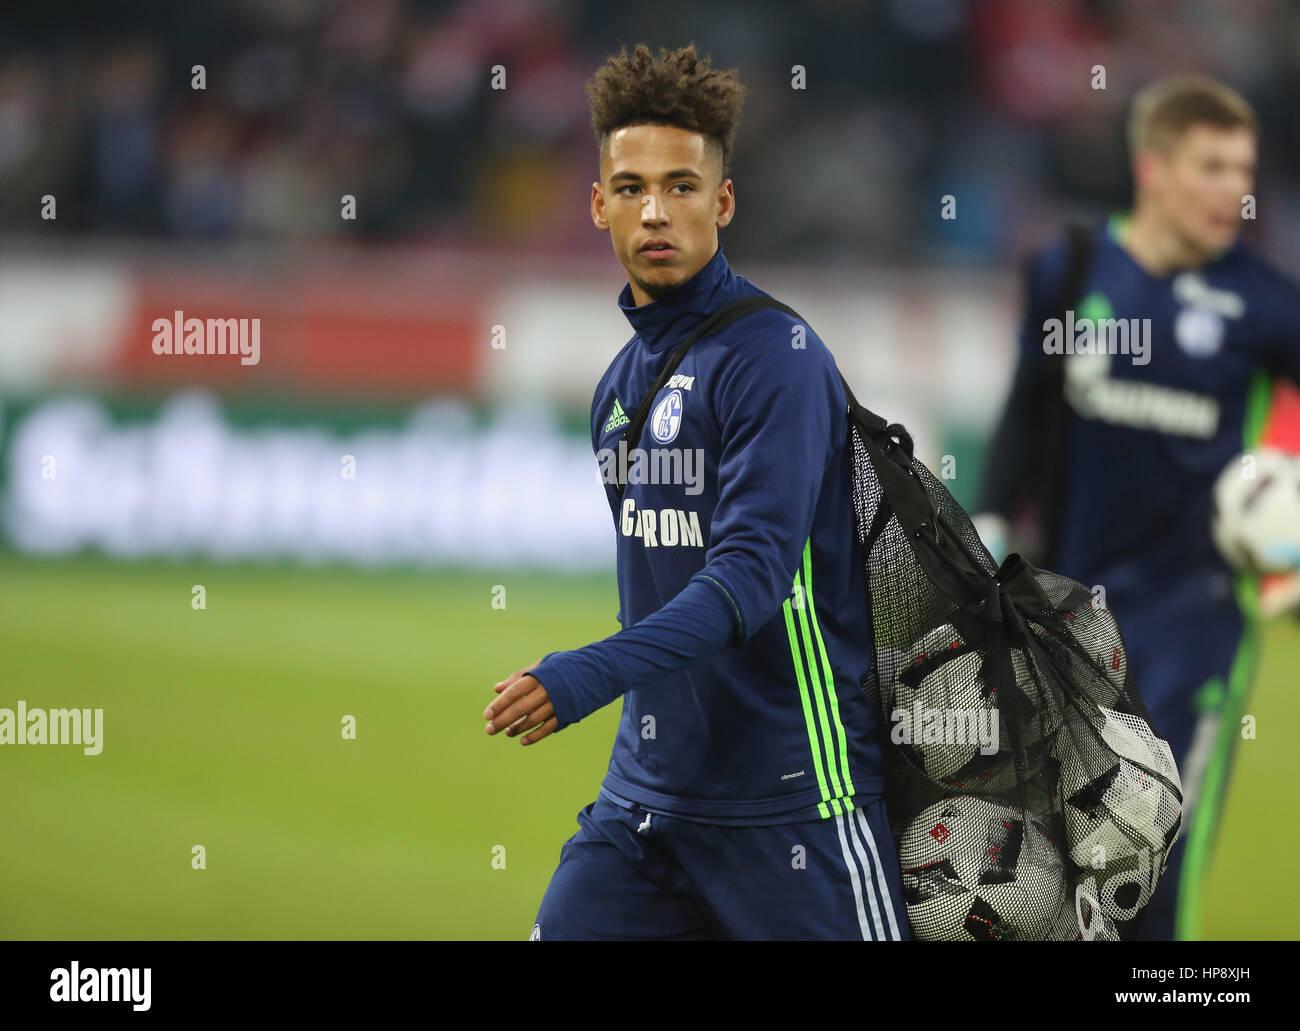 Cologne, Germany, February 19, 2017, Bundesliga matchday 21, 1. FC Koeln - FC Schalke 04:  Thilo Kehrer (Schalke). - Stock Image